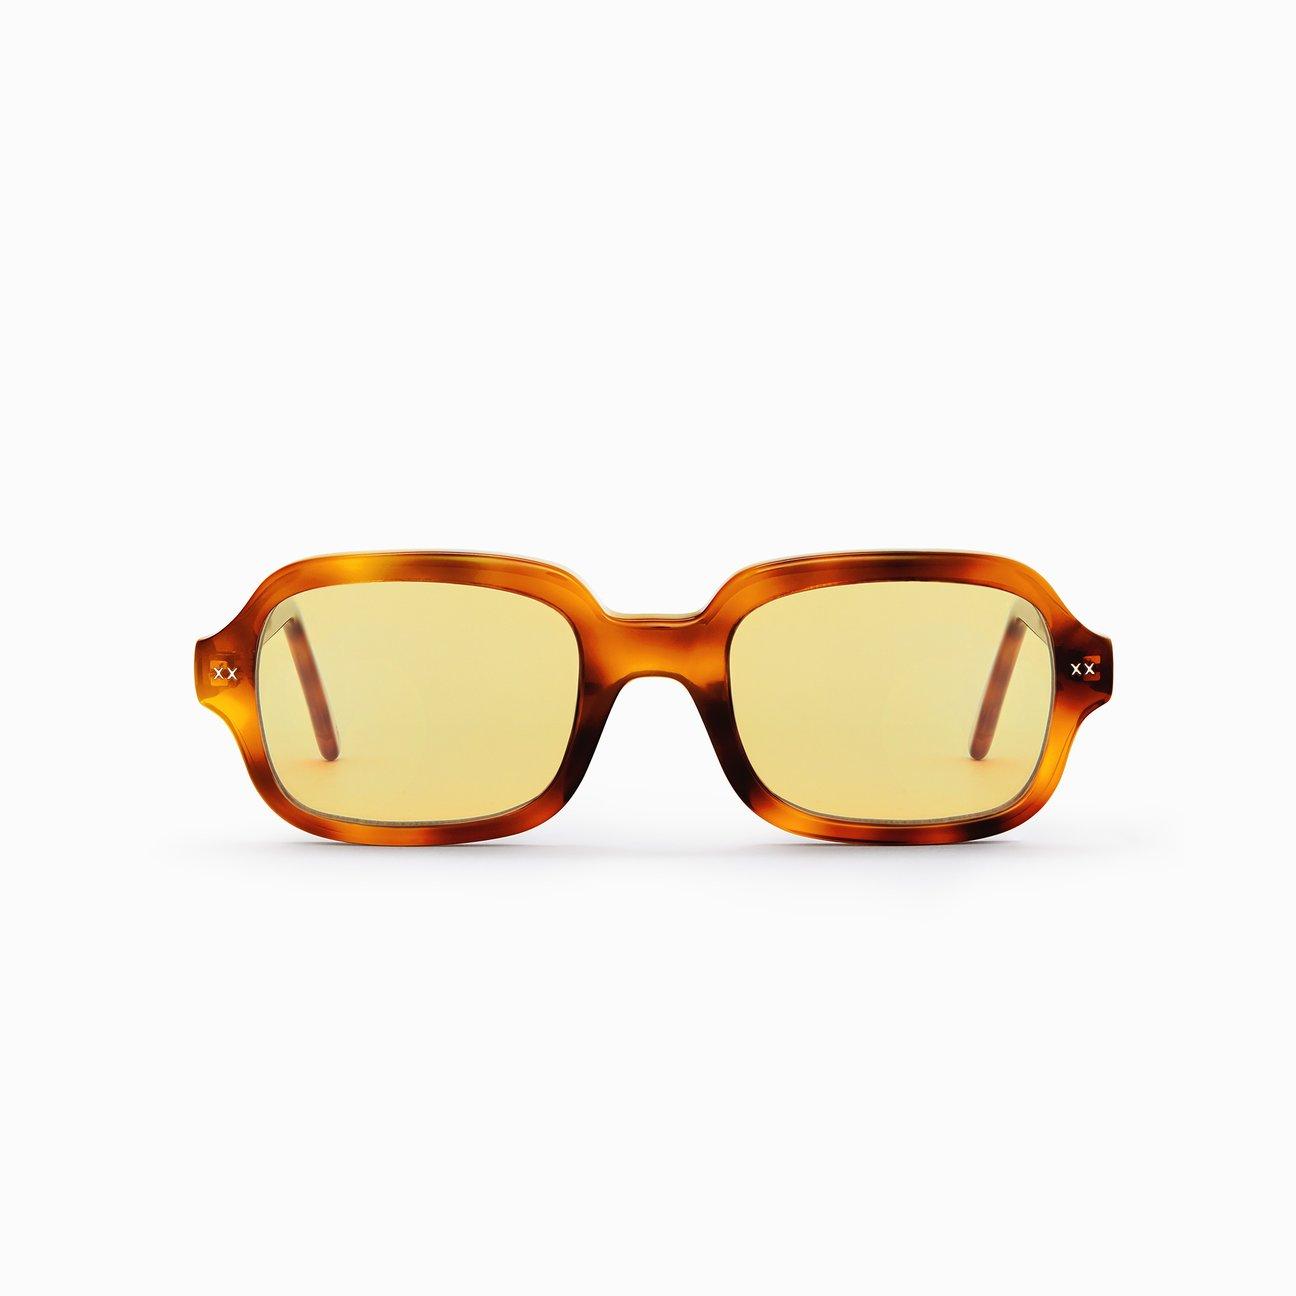 Jordy / Tortoise / Yellow by Lexxola, available on lexxola.com for EUR190 Kendall Jenner Sunglasses Exact Product